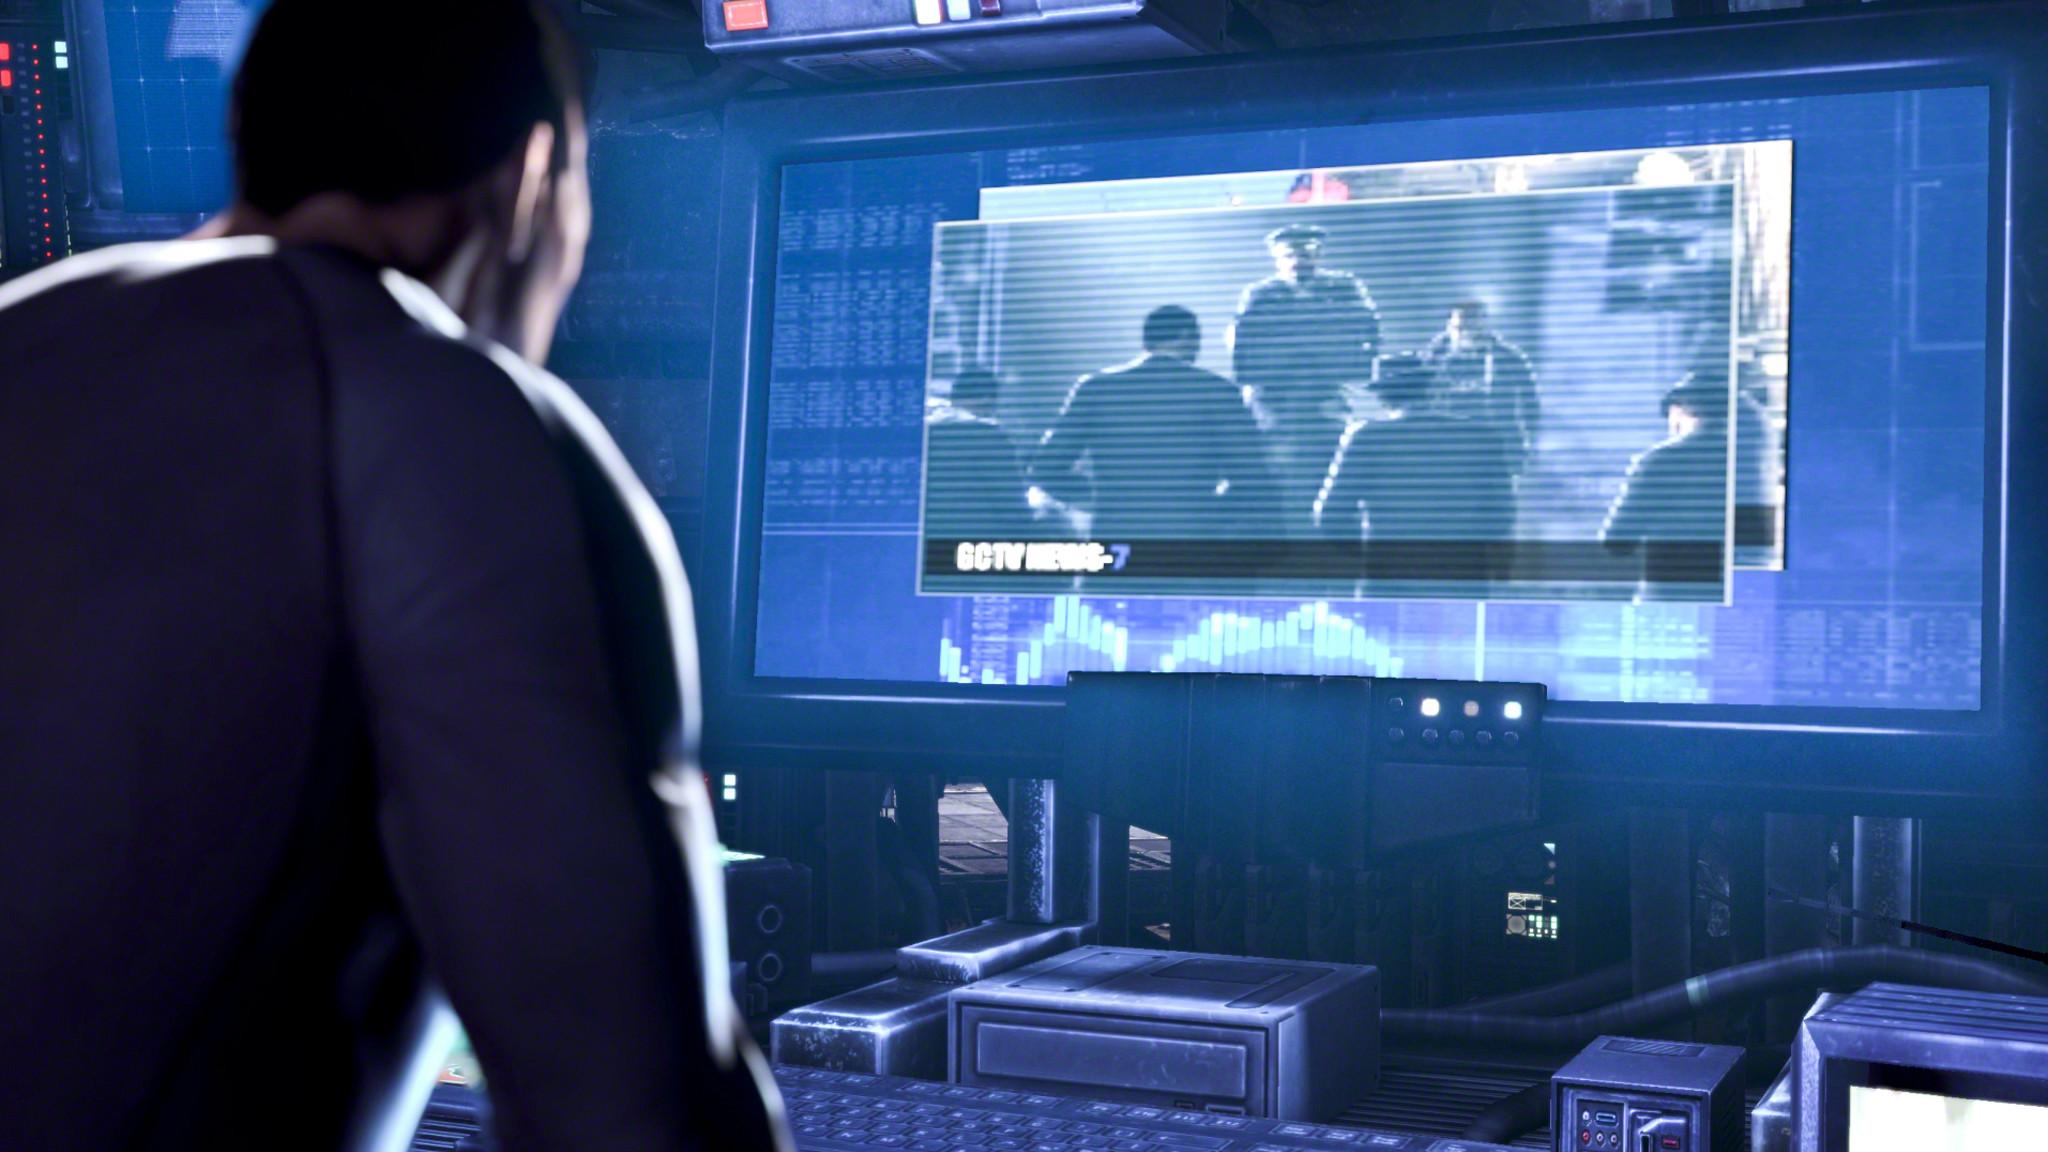 Filename: Batman_Arkham_Origins_ABAO_EMEA_BruceBatcomputer-pc-games.jpg